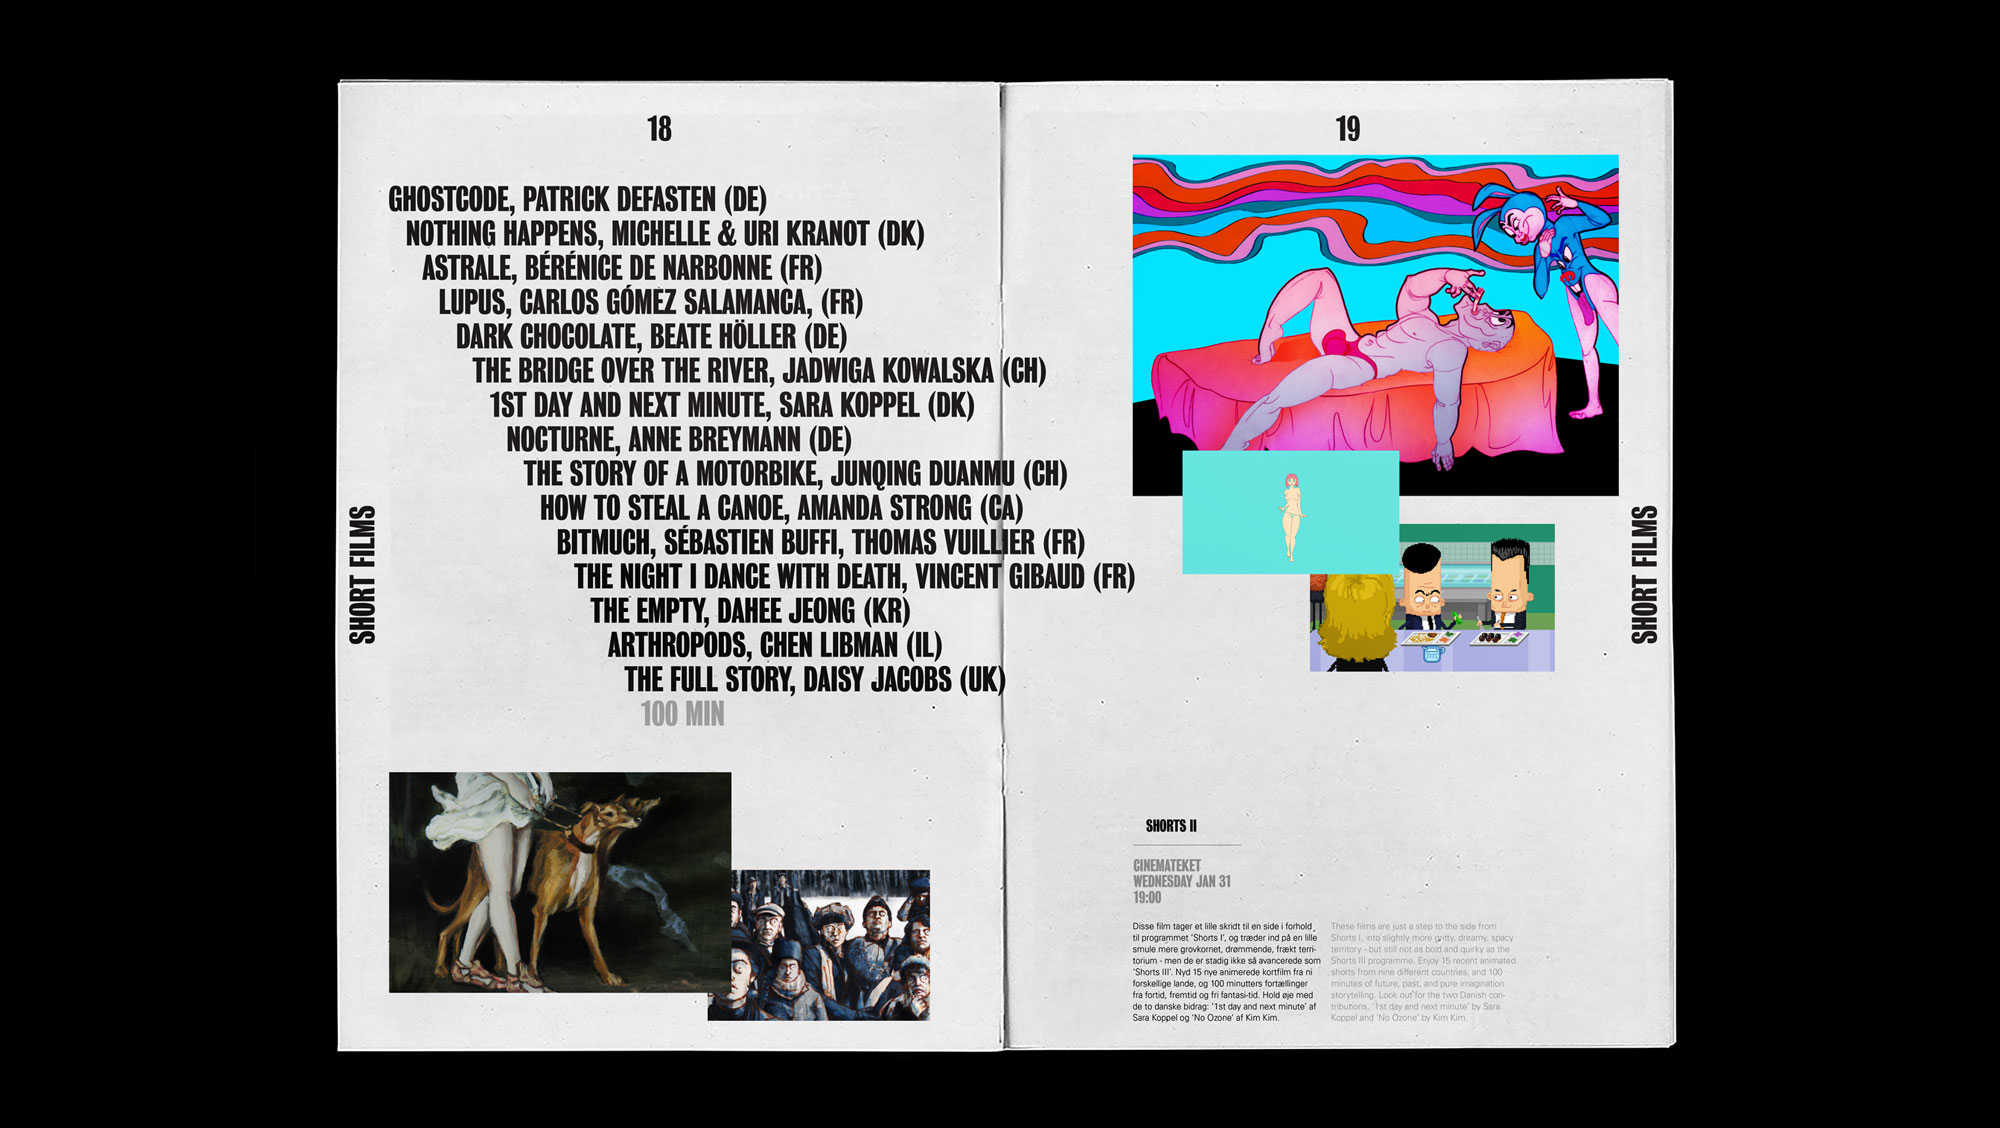 Fuhr_Studio_Design_og_branding_bureau_Void_Visuel_Identitet_012.jpg